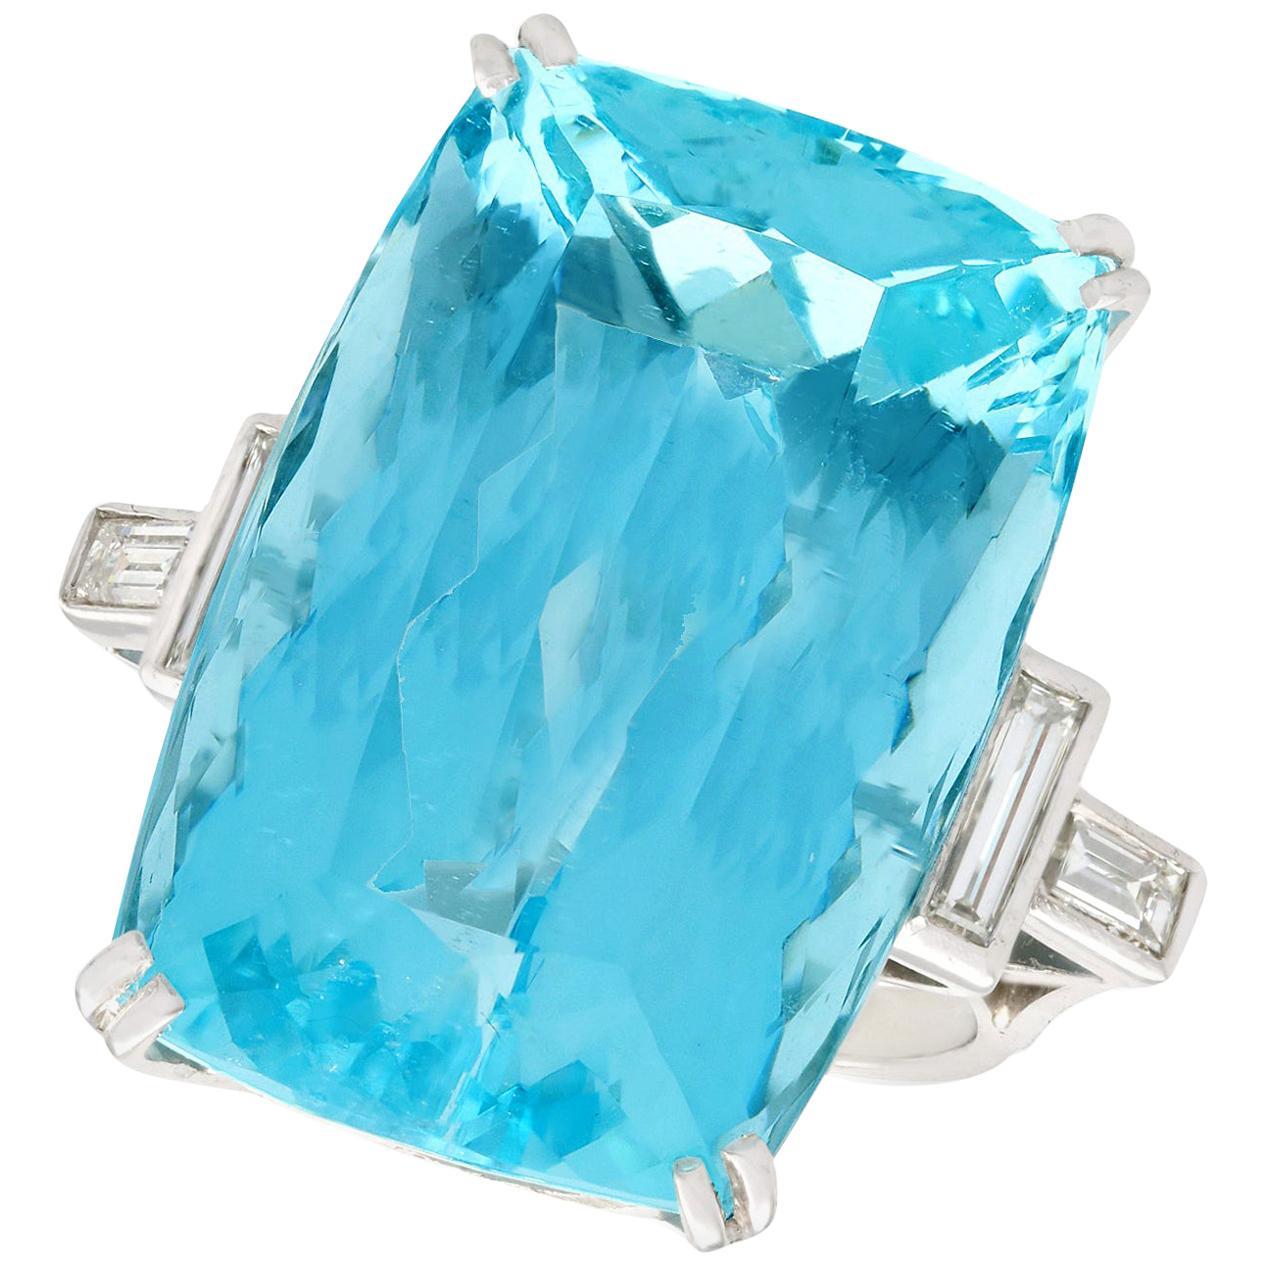 1970s 45.09 Carat Aquamarine Diamond White Gold Cocktail Ring